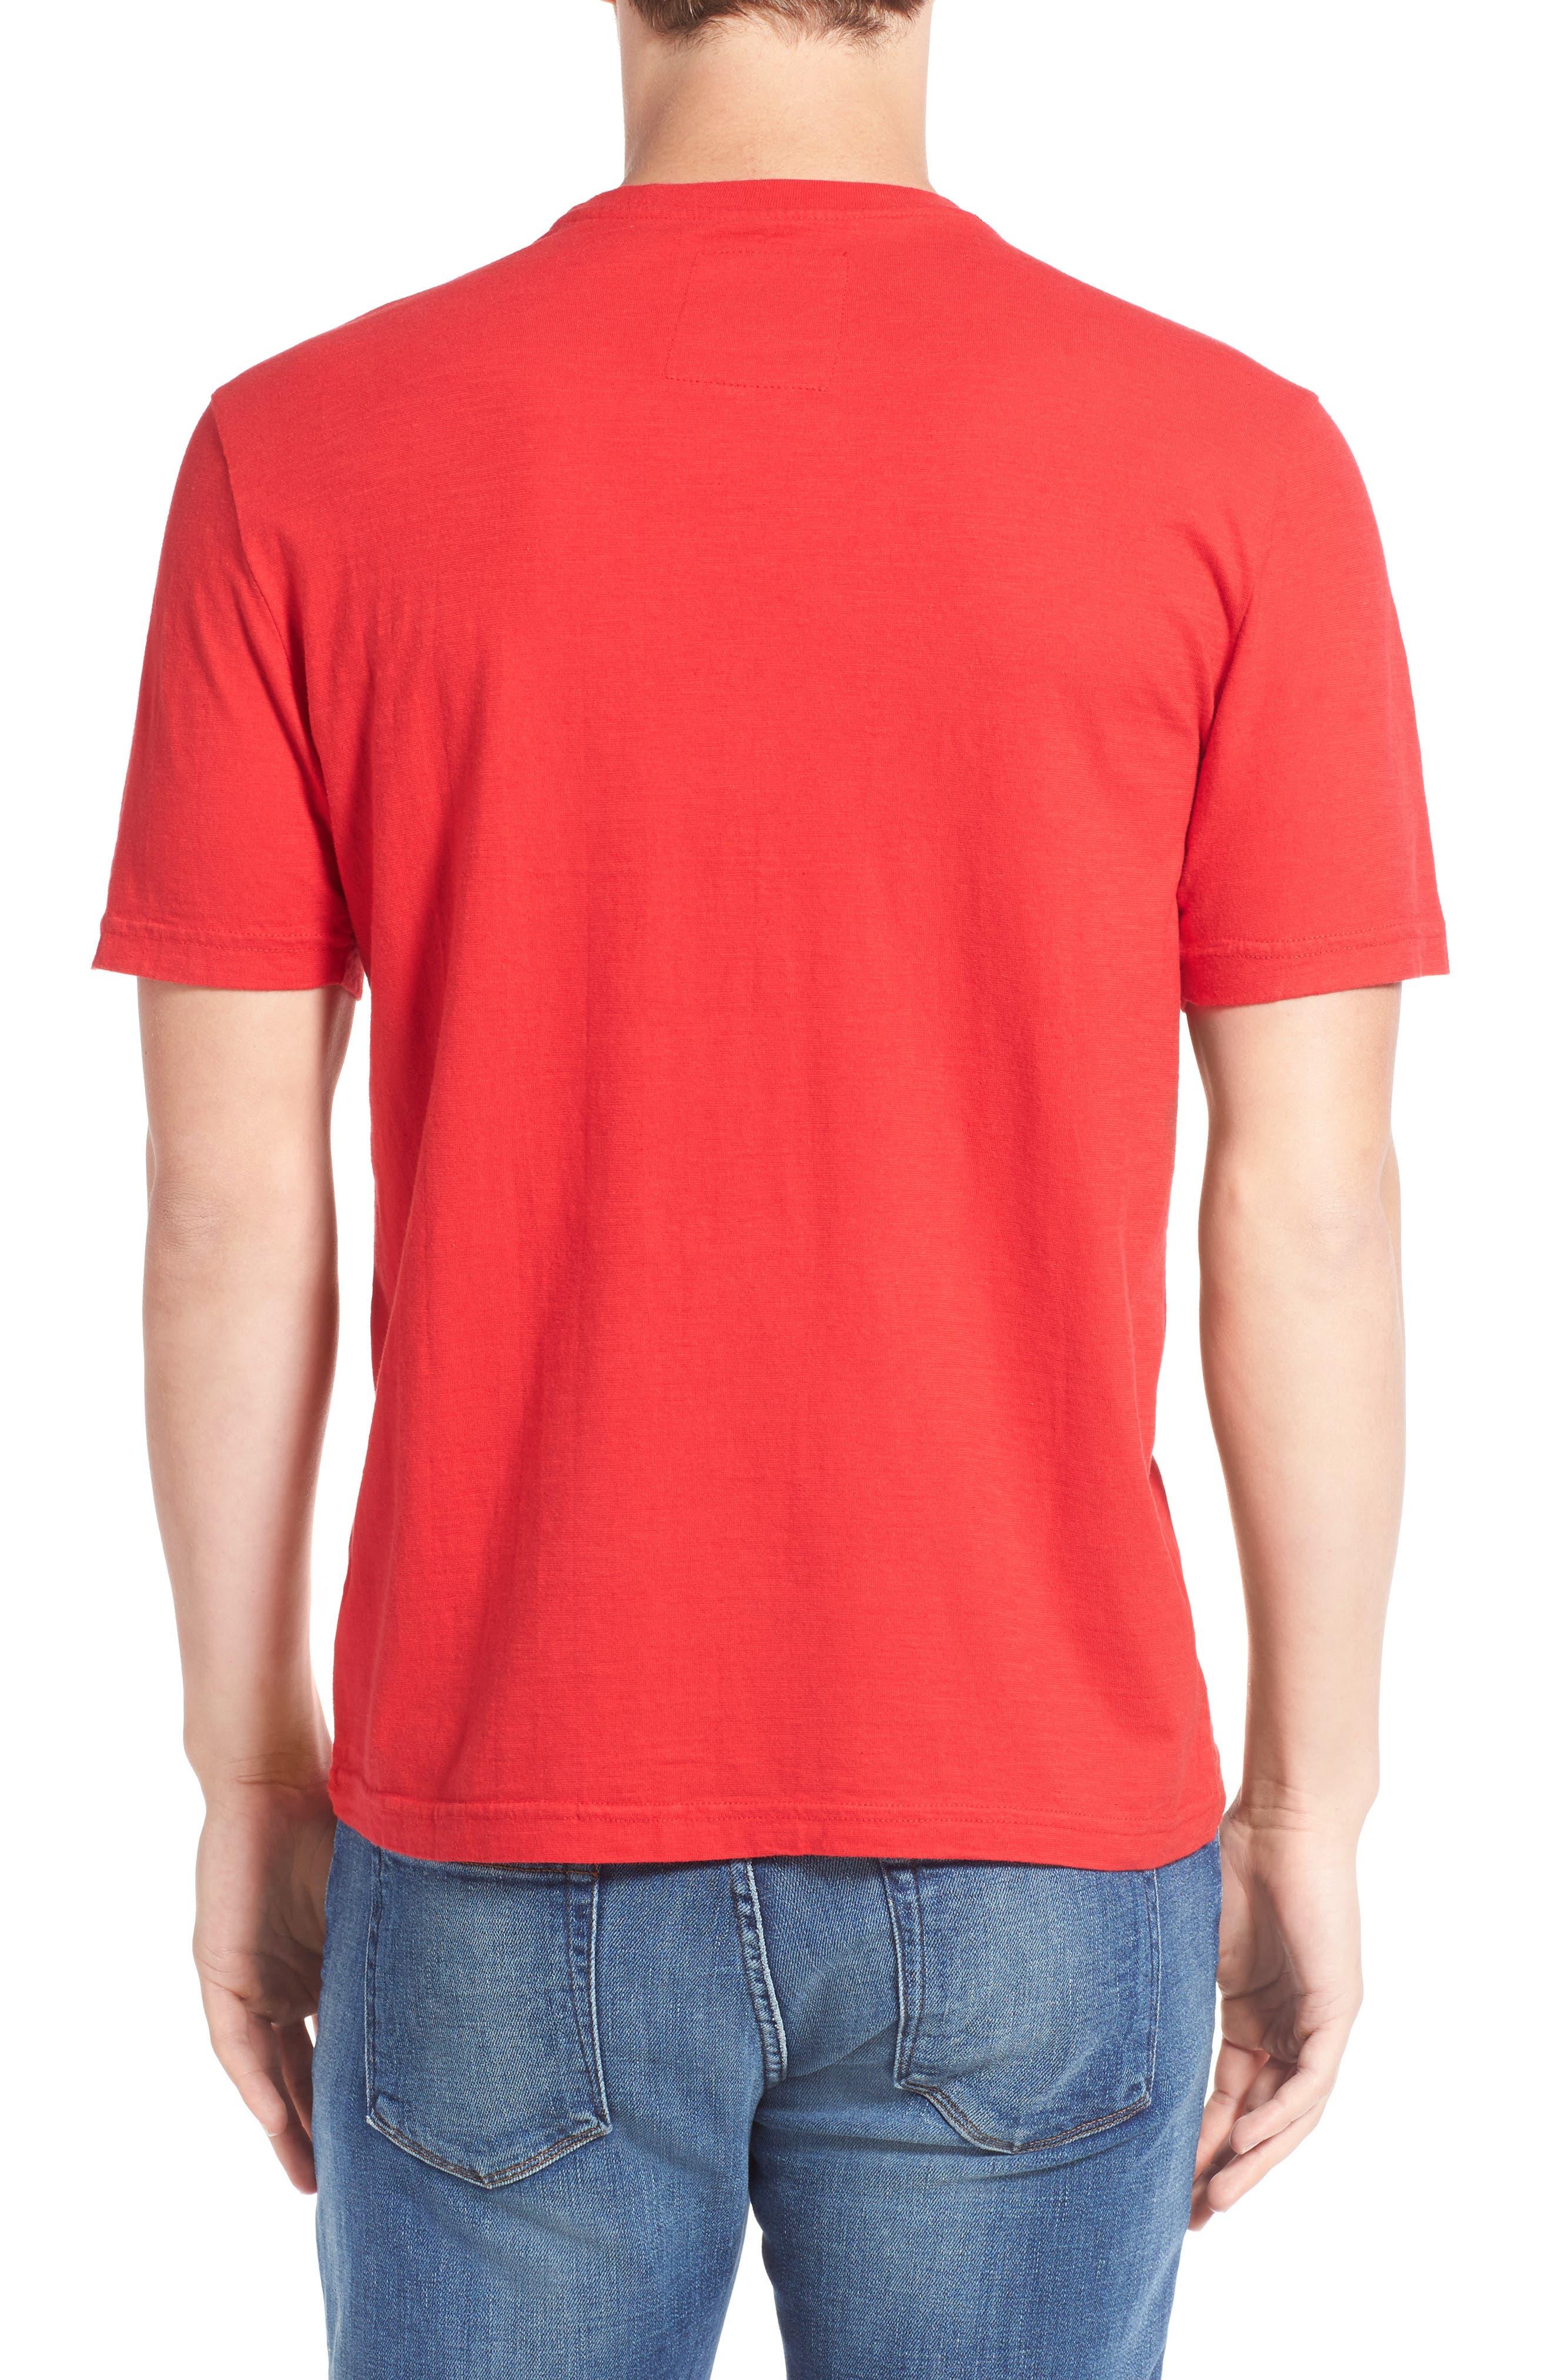 'Cincinnati Reds - Twofold' Crewneck T-Shirt,                             Alternate thumbnail 5, color,                             600